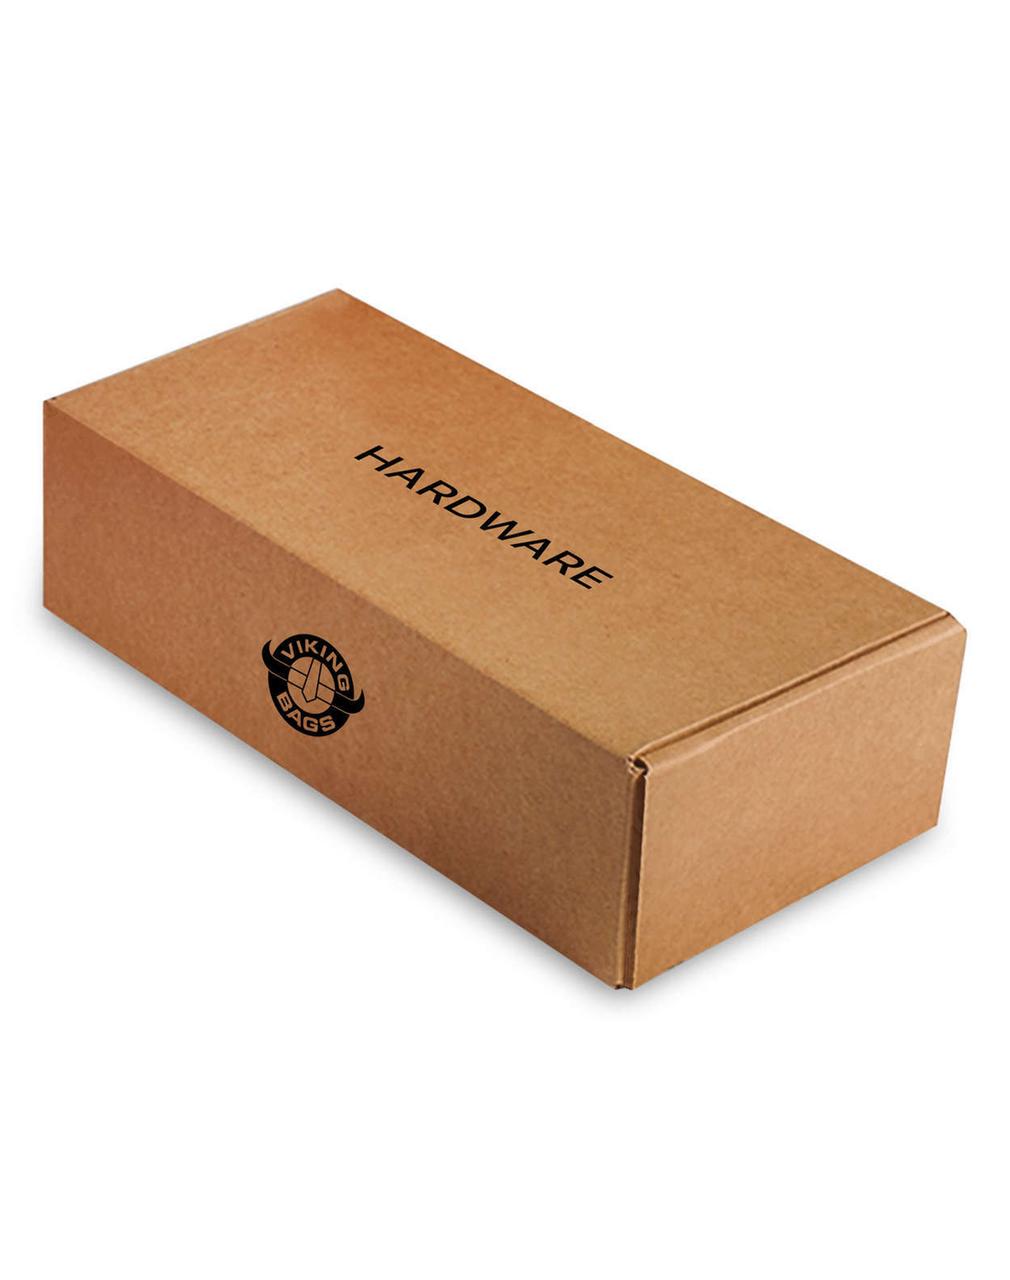 Triumph Rocket III Roadster Viking Lamellar Leather Covered Shock Cutout Hard Saddlebag Box